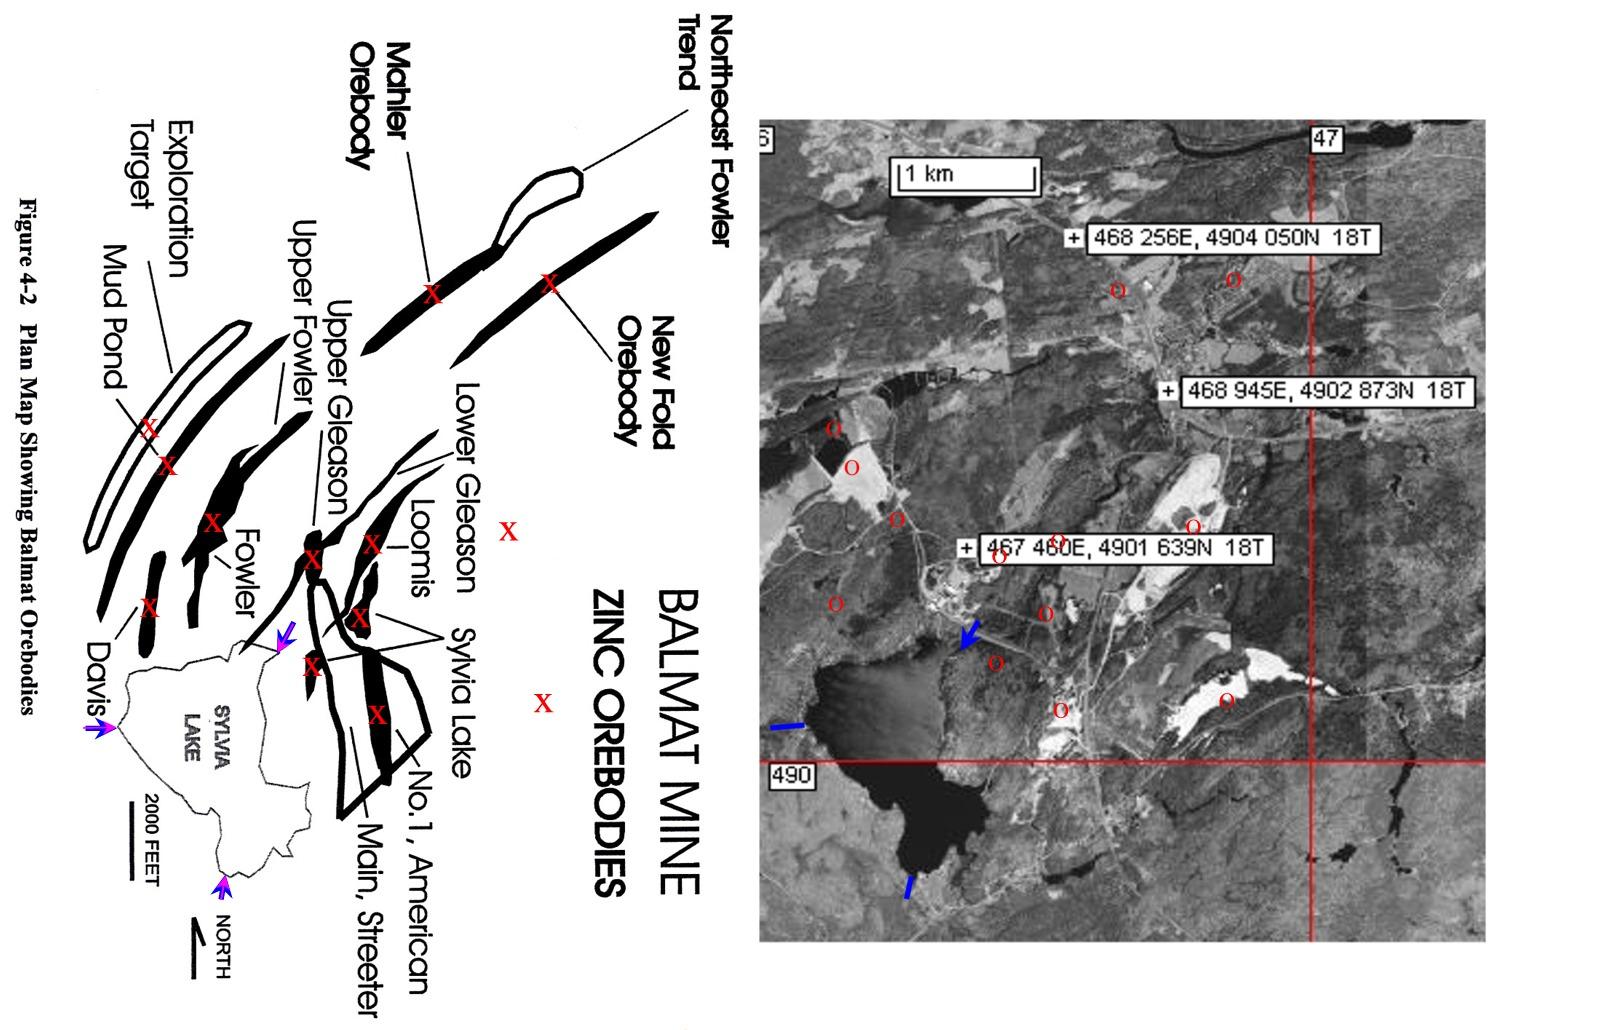 Geology of the Adirondacks - Balmat, Sandford Lake, and Gore